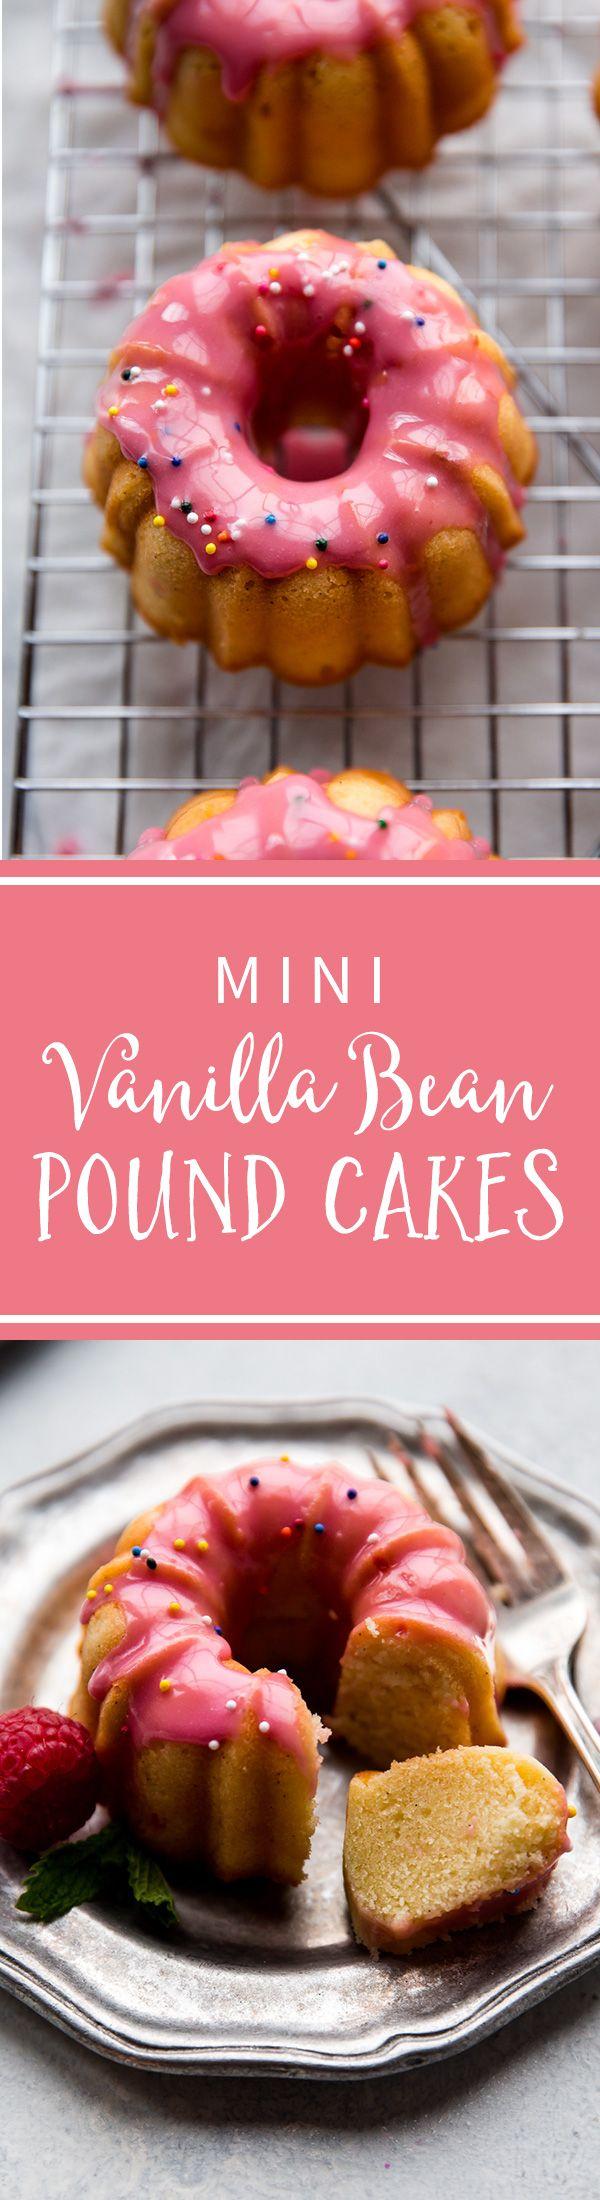 Mini vanilla pound cakes topped with sweet raspberry icing, made from fresh raspberries! Mini bundt cake recipe on sallysbakingaddiction.com